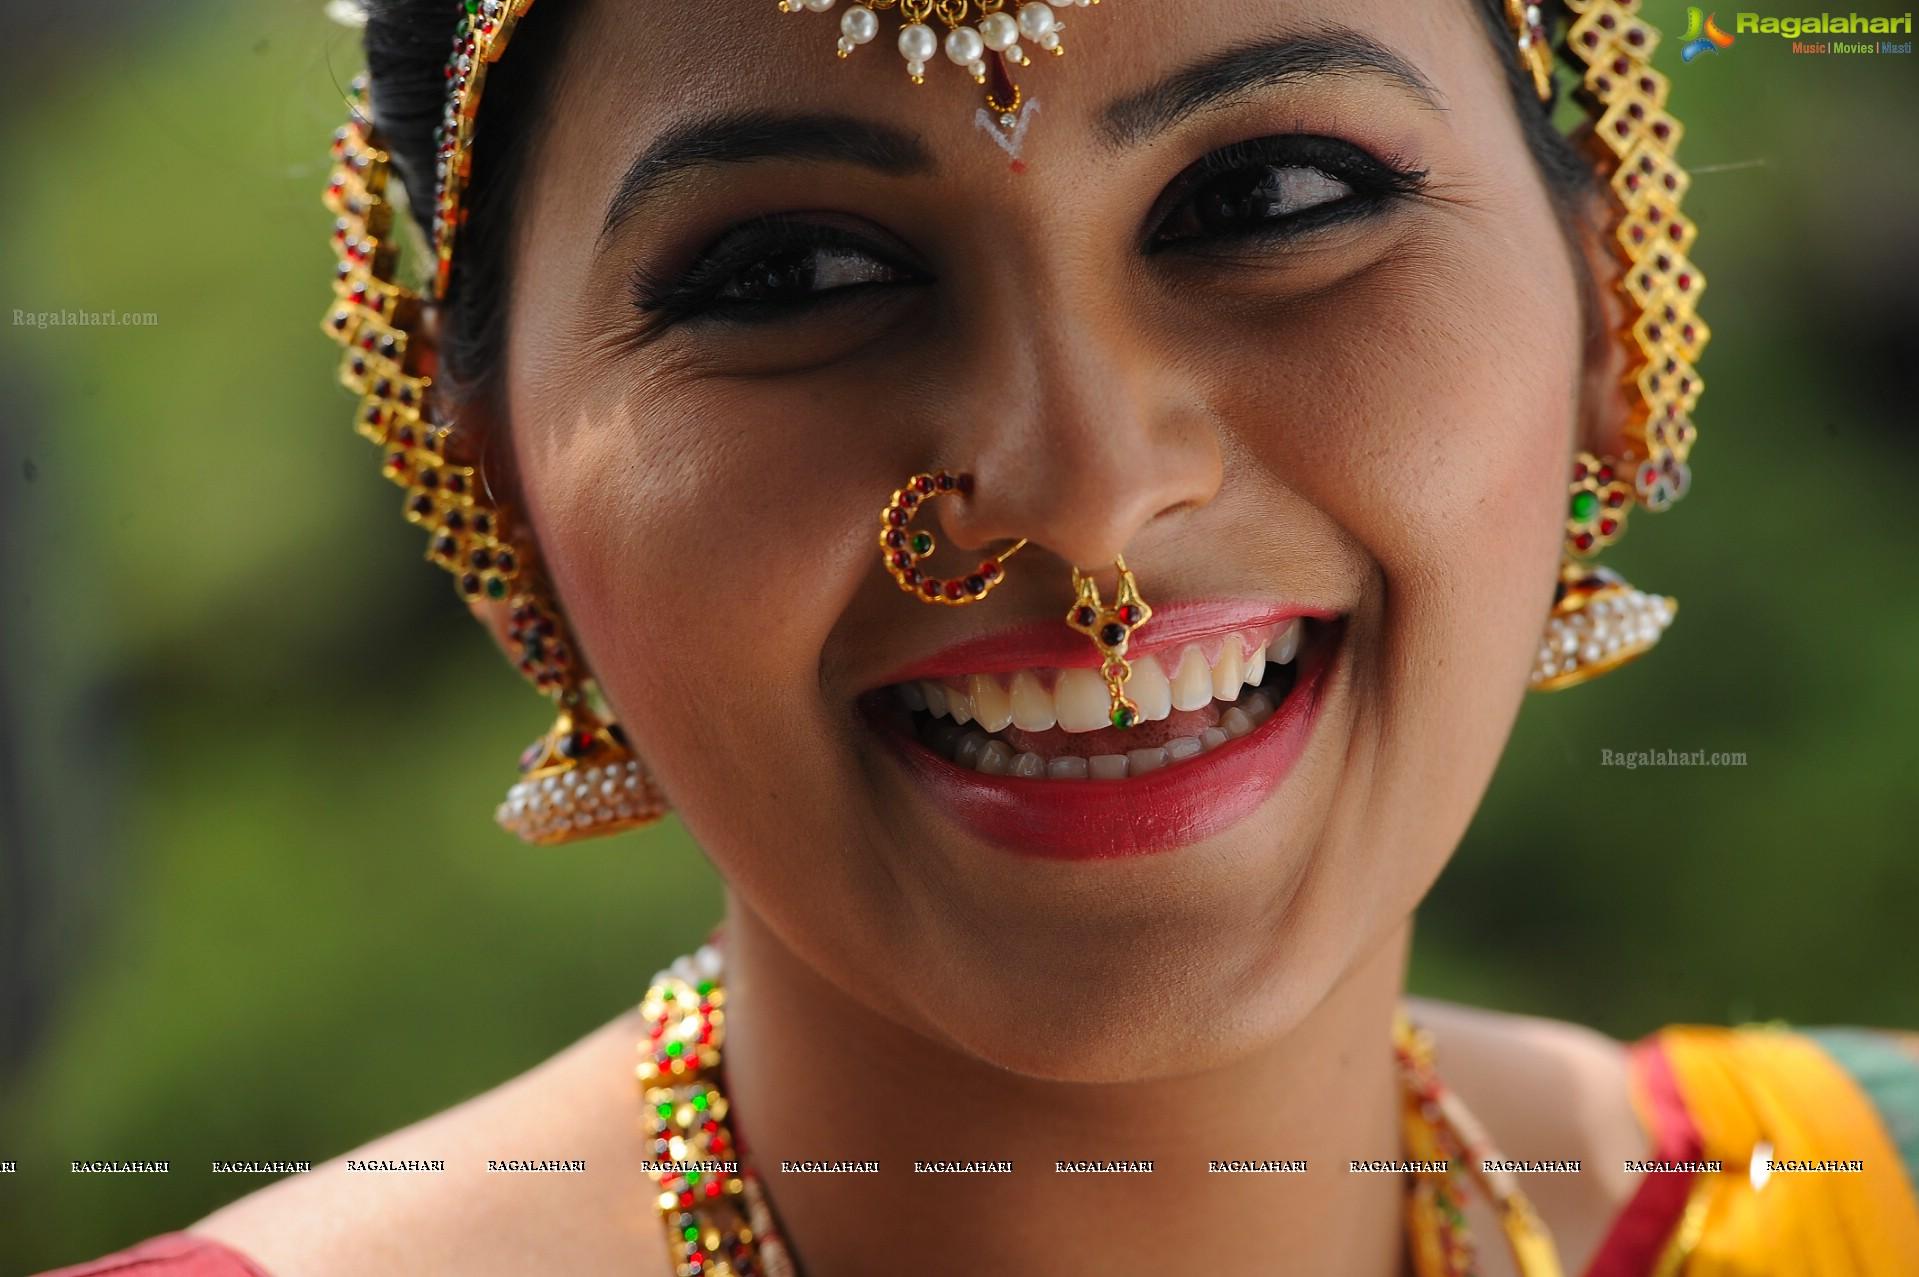 anjali (high definition) image 26 | telugu heroines photos